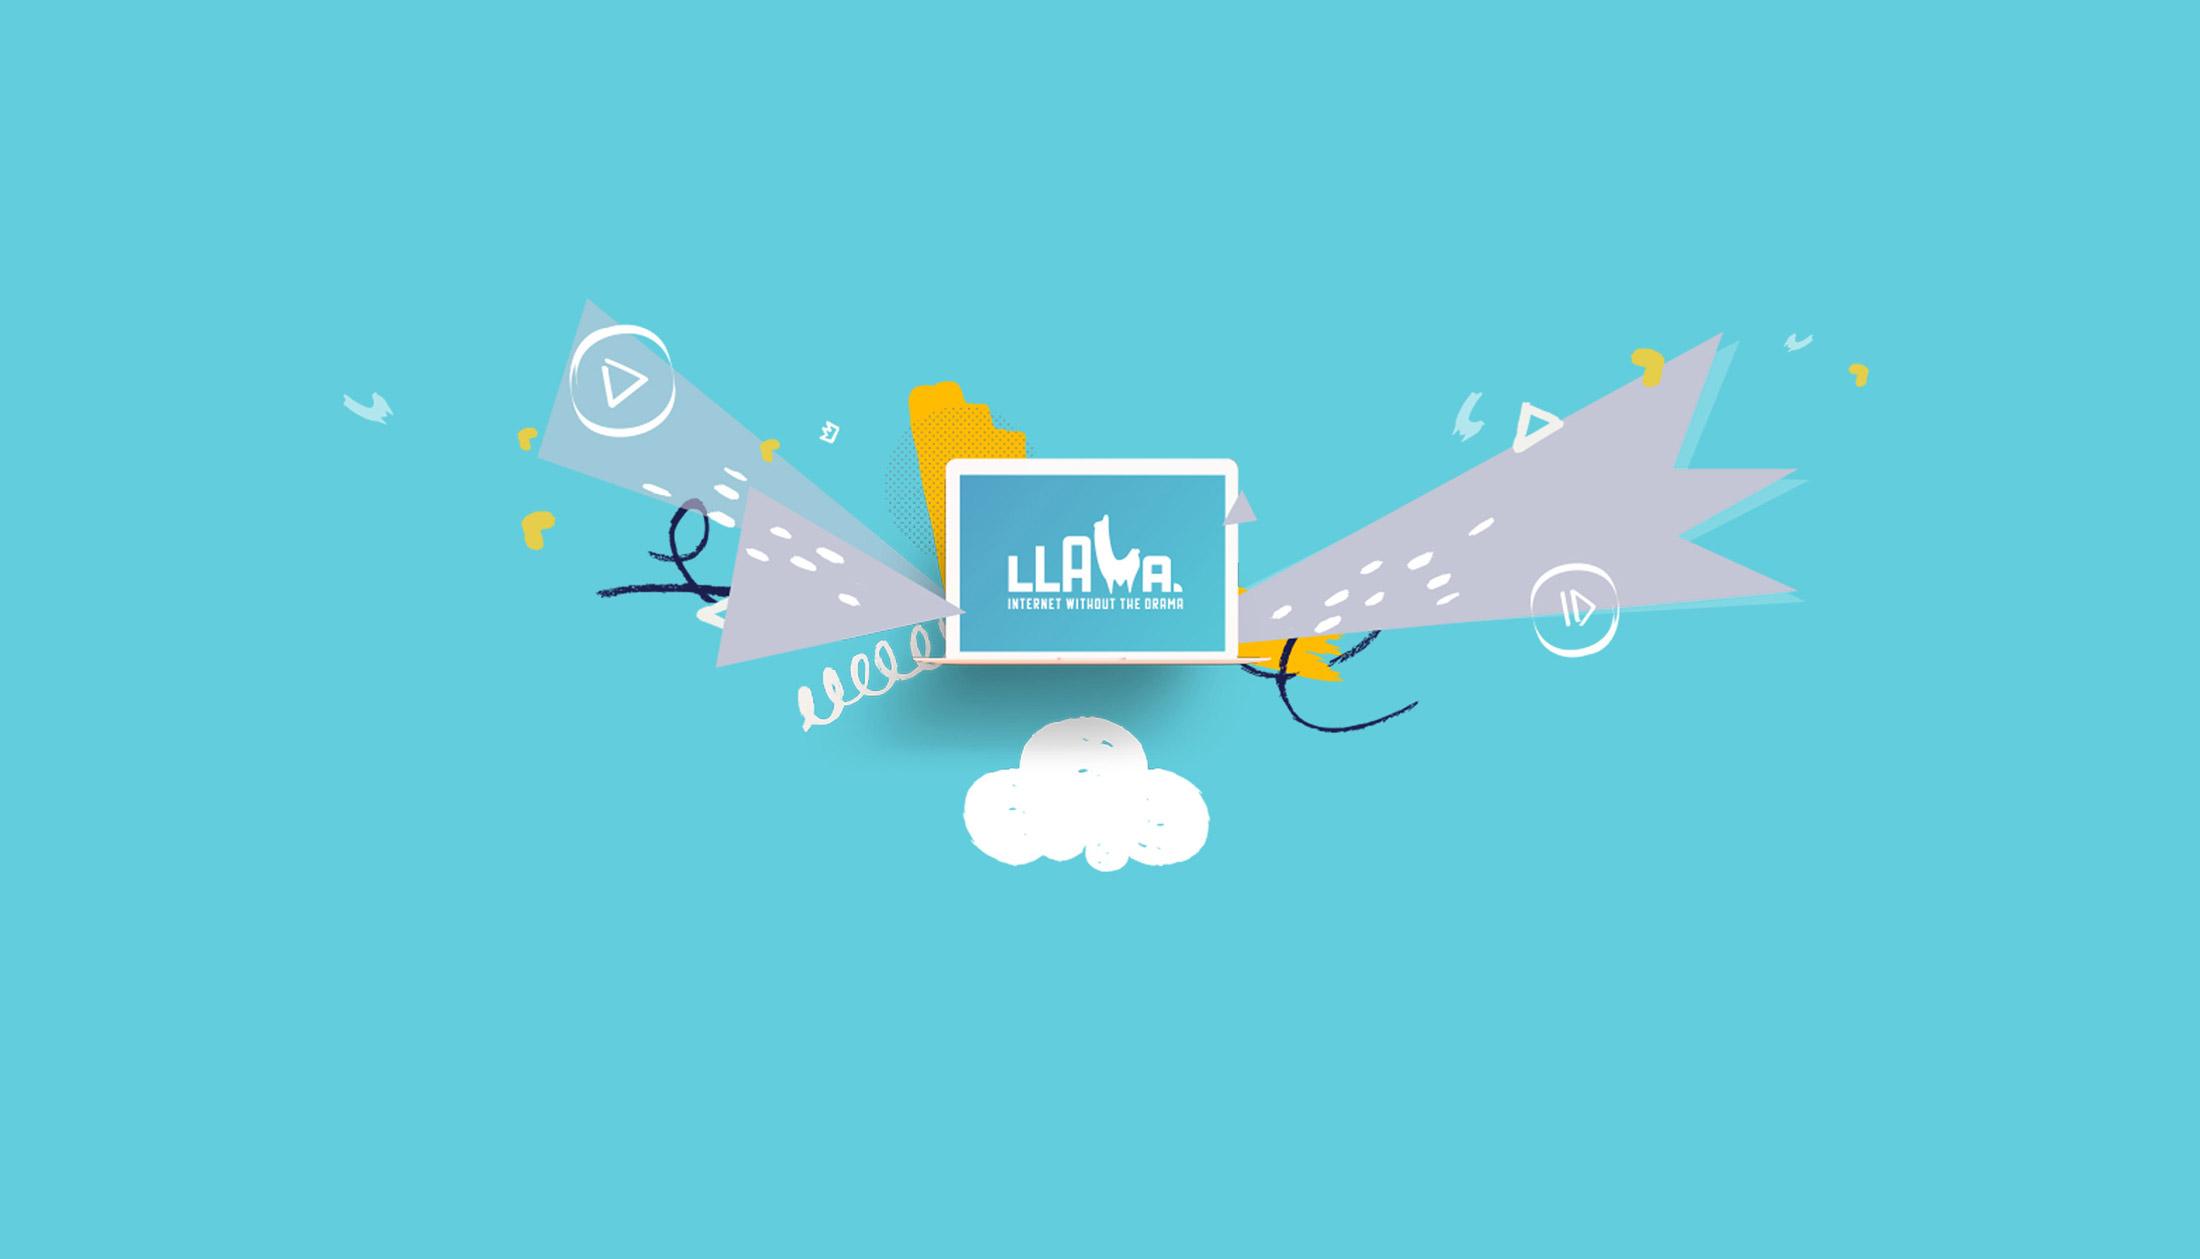 Llama internet without the drama